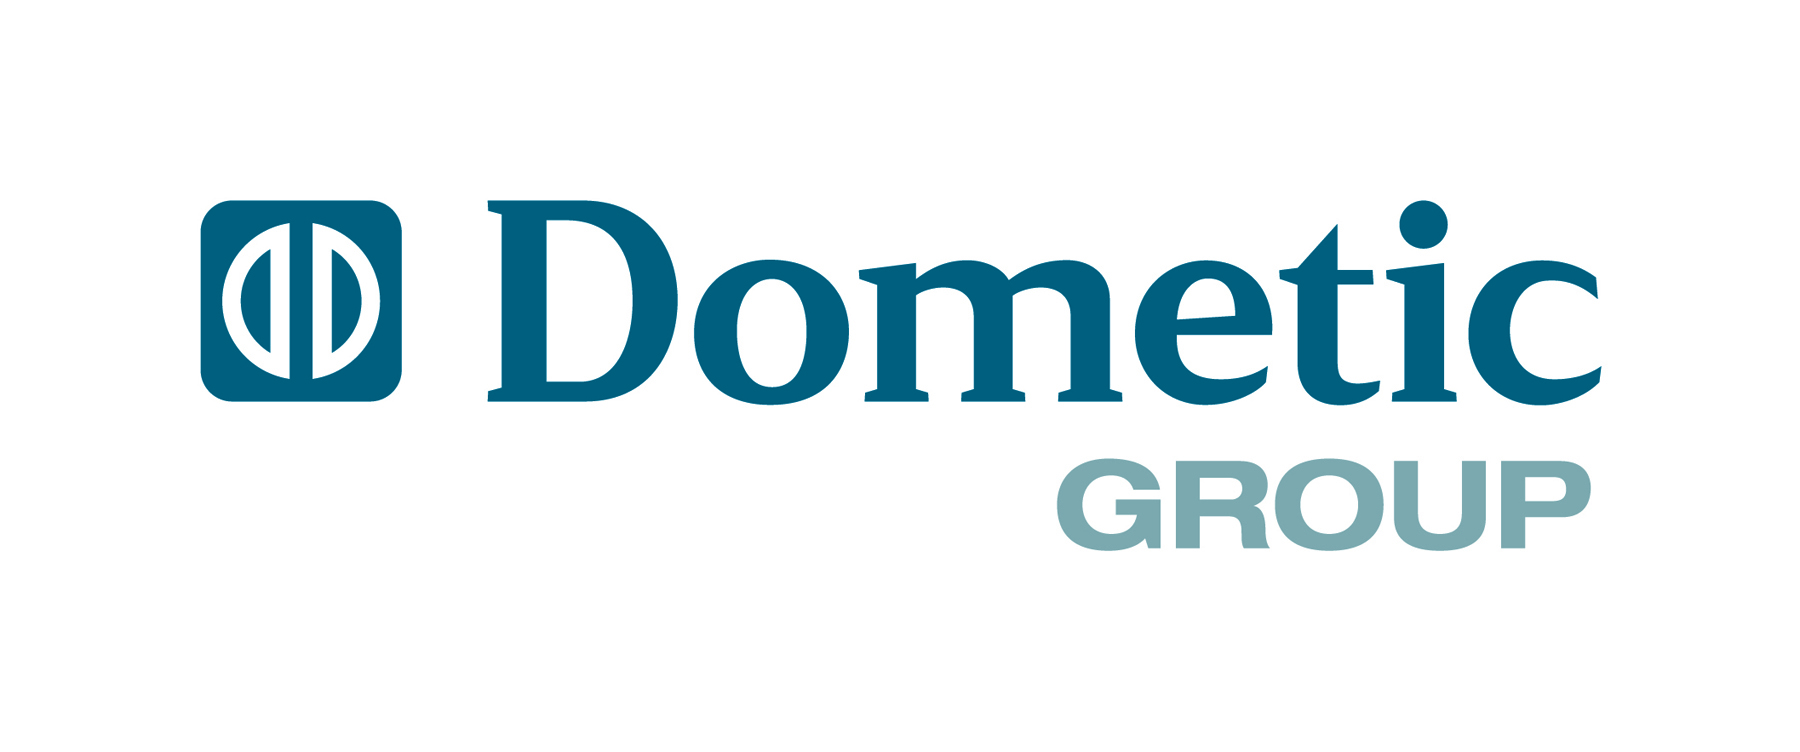 DometicGroupLogoCMYK2010